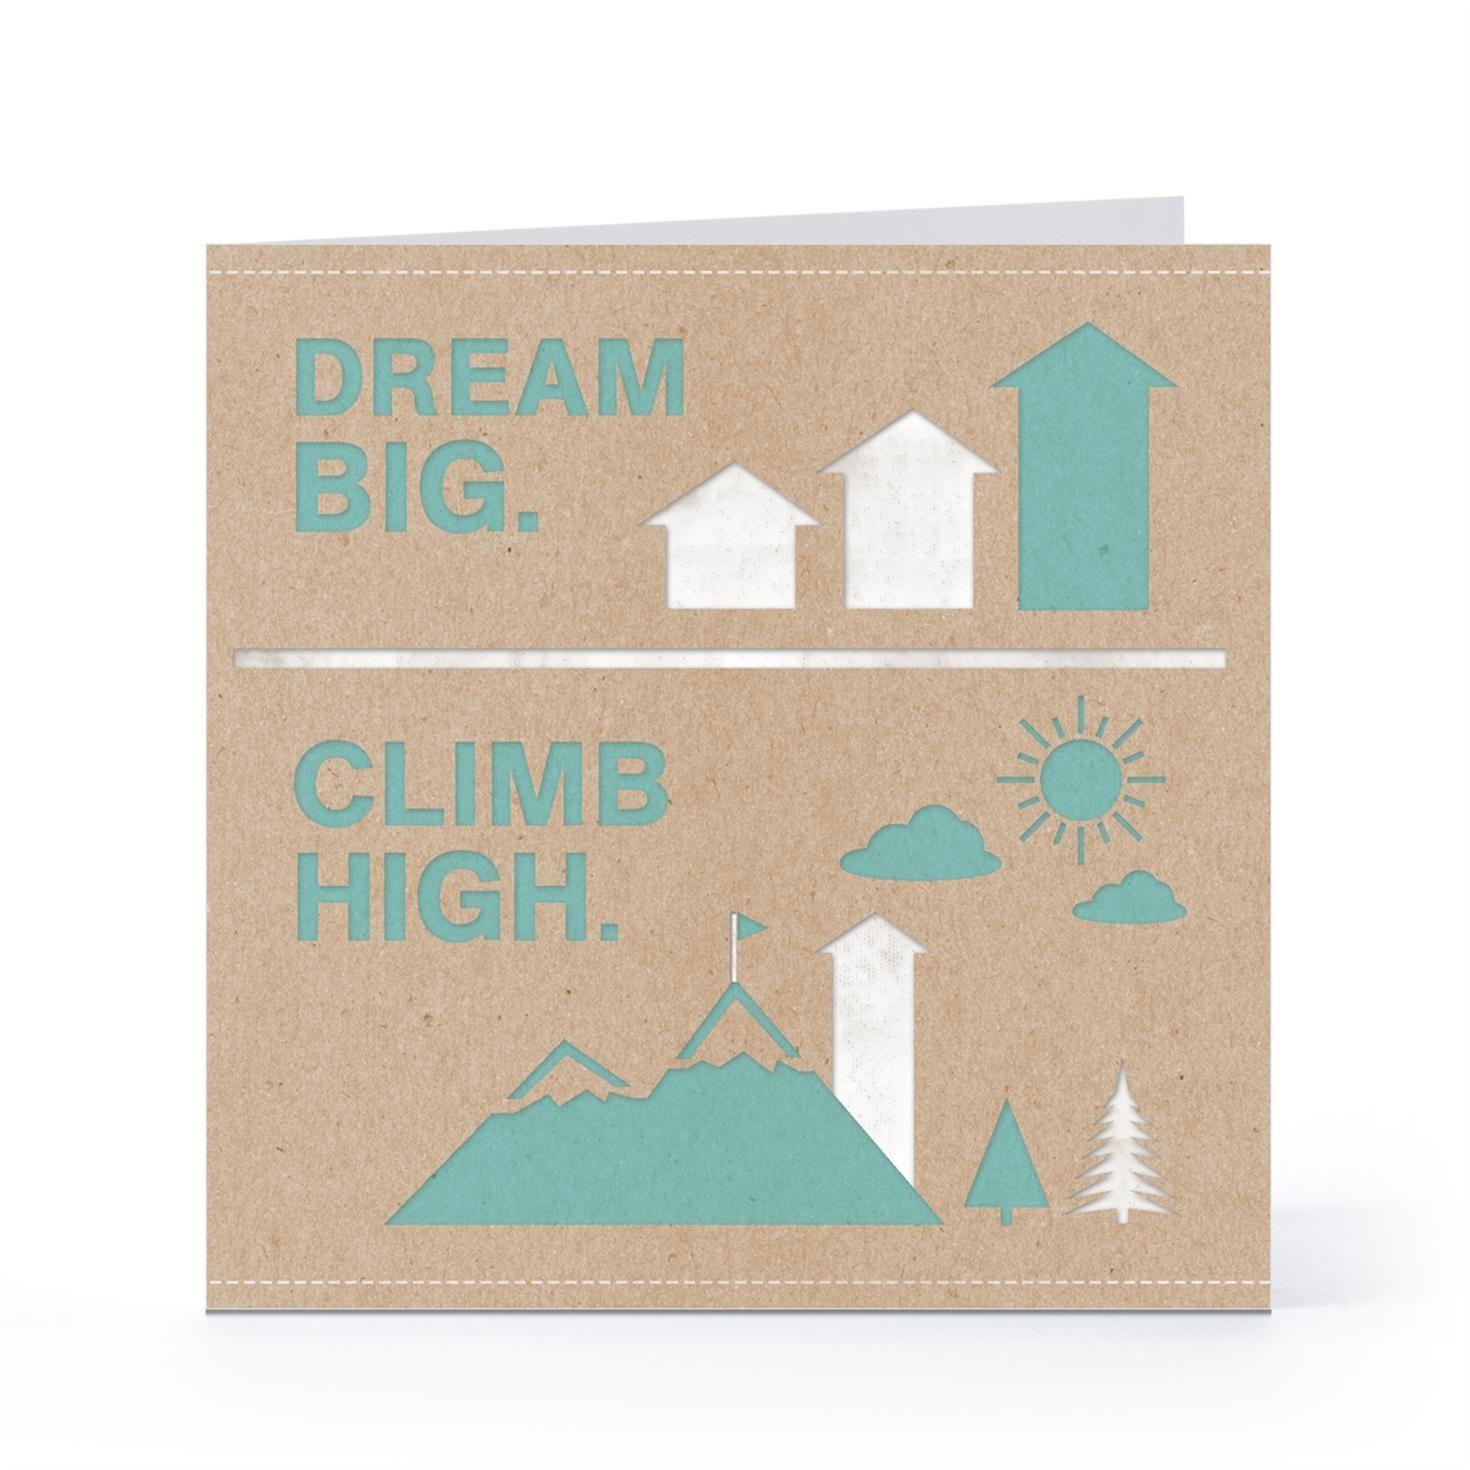 Dream big climb high birthday cards cards and